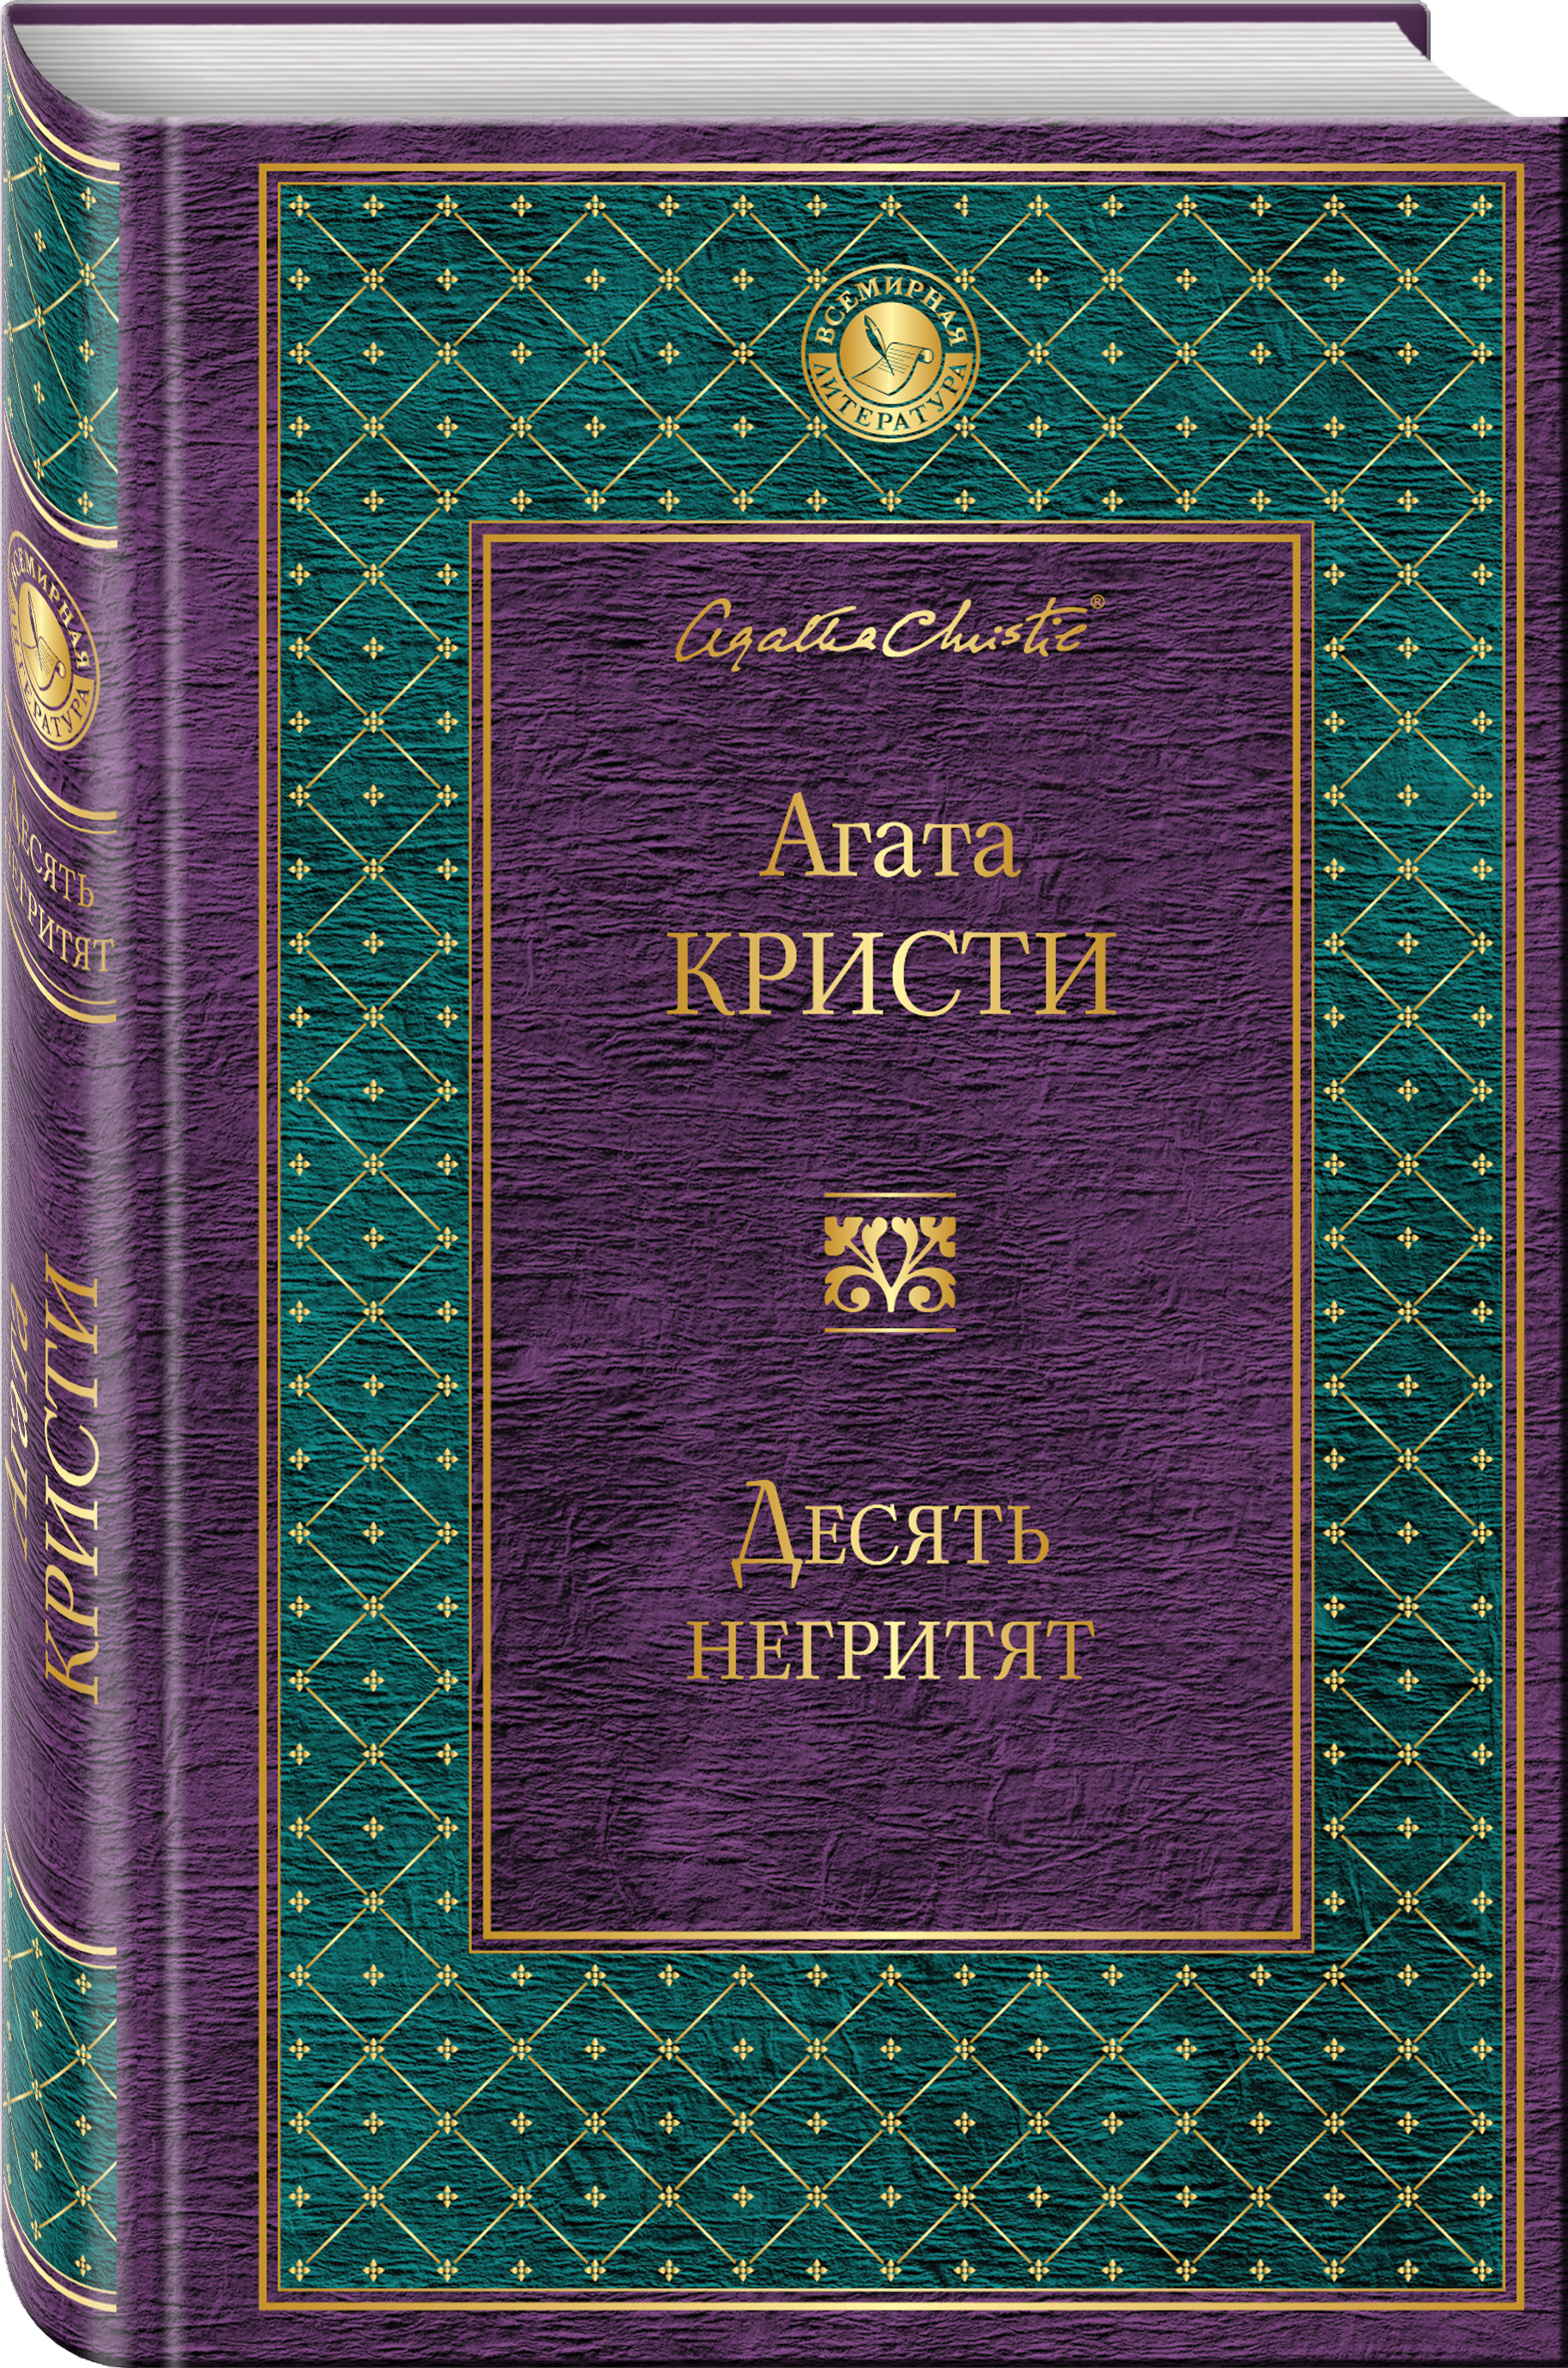 Агата Кристи Десять негритят ISBN: 978-5-699-93035-7